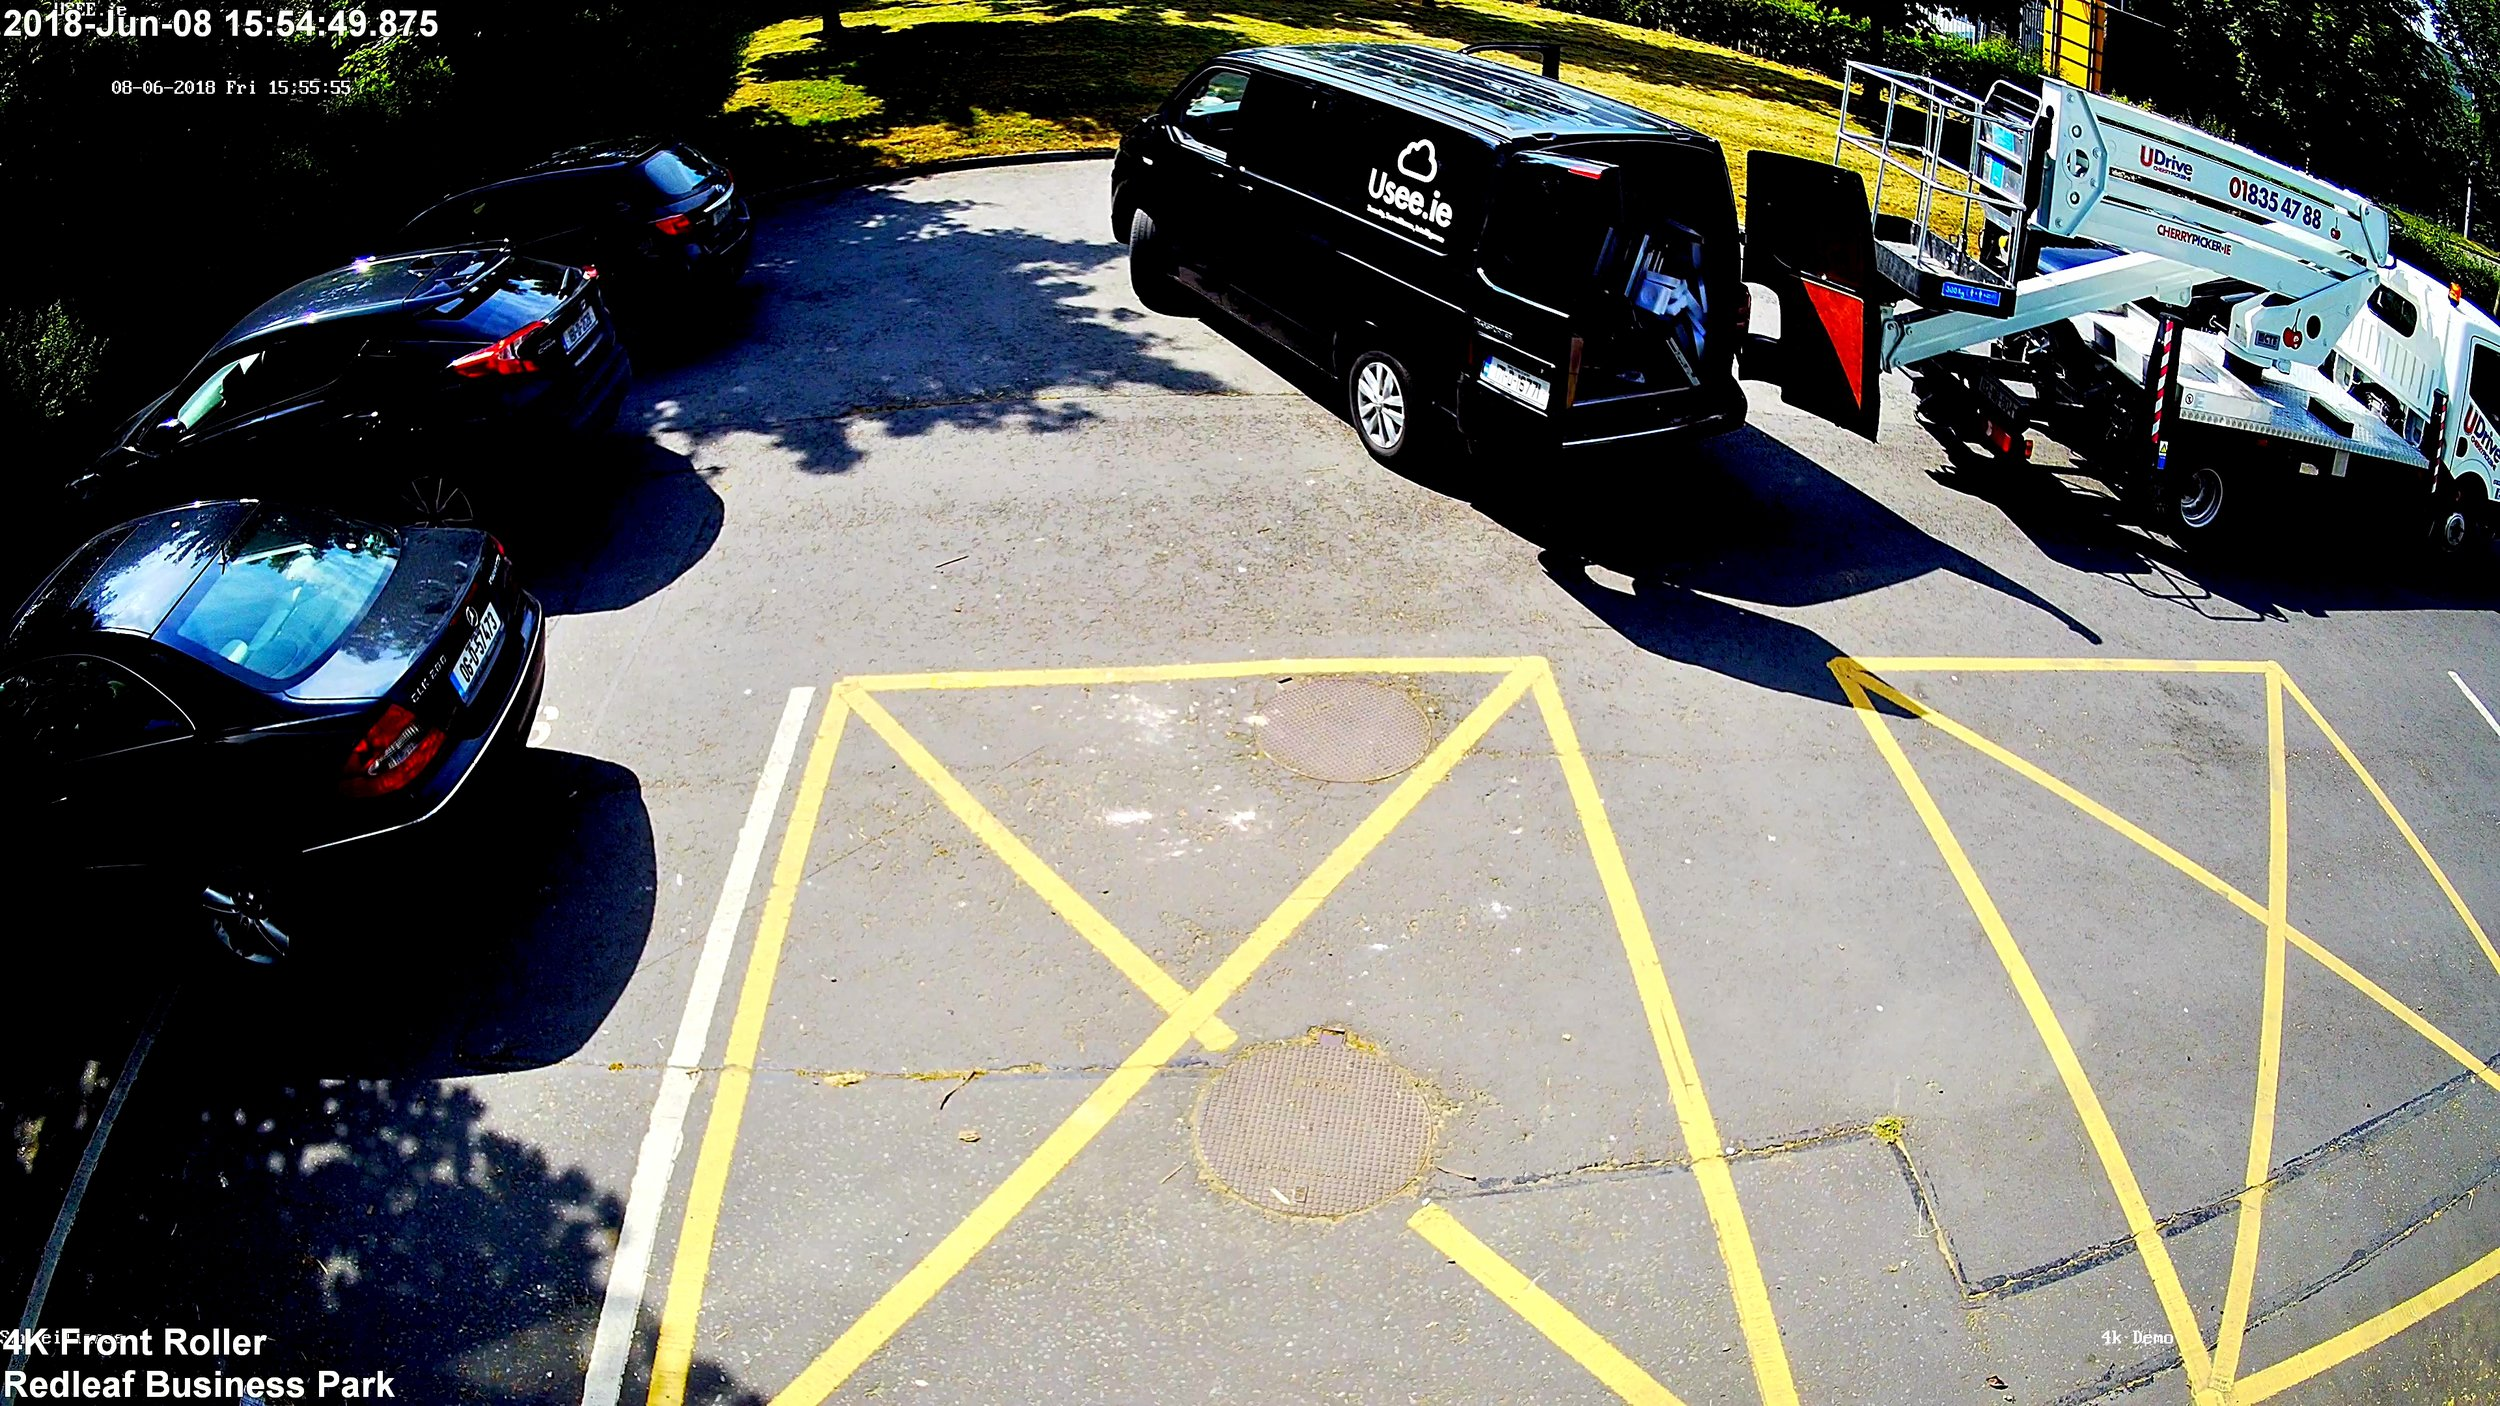 HD CCTV by Usee.ie